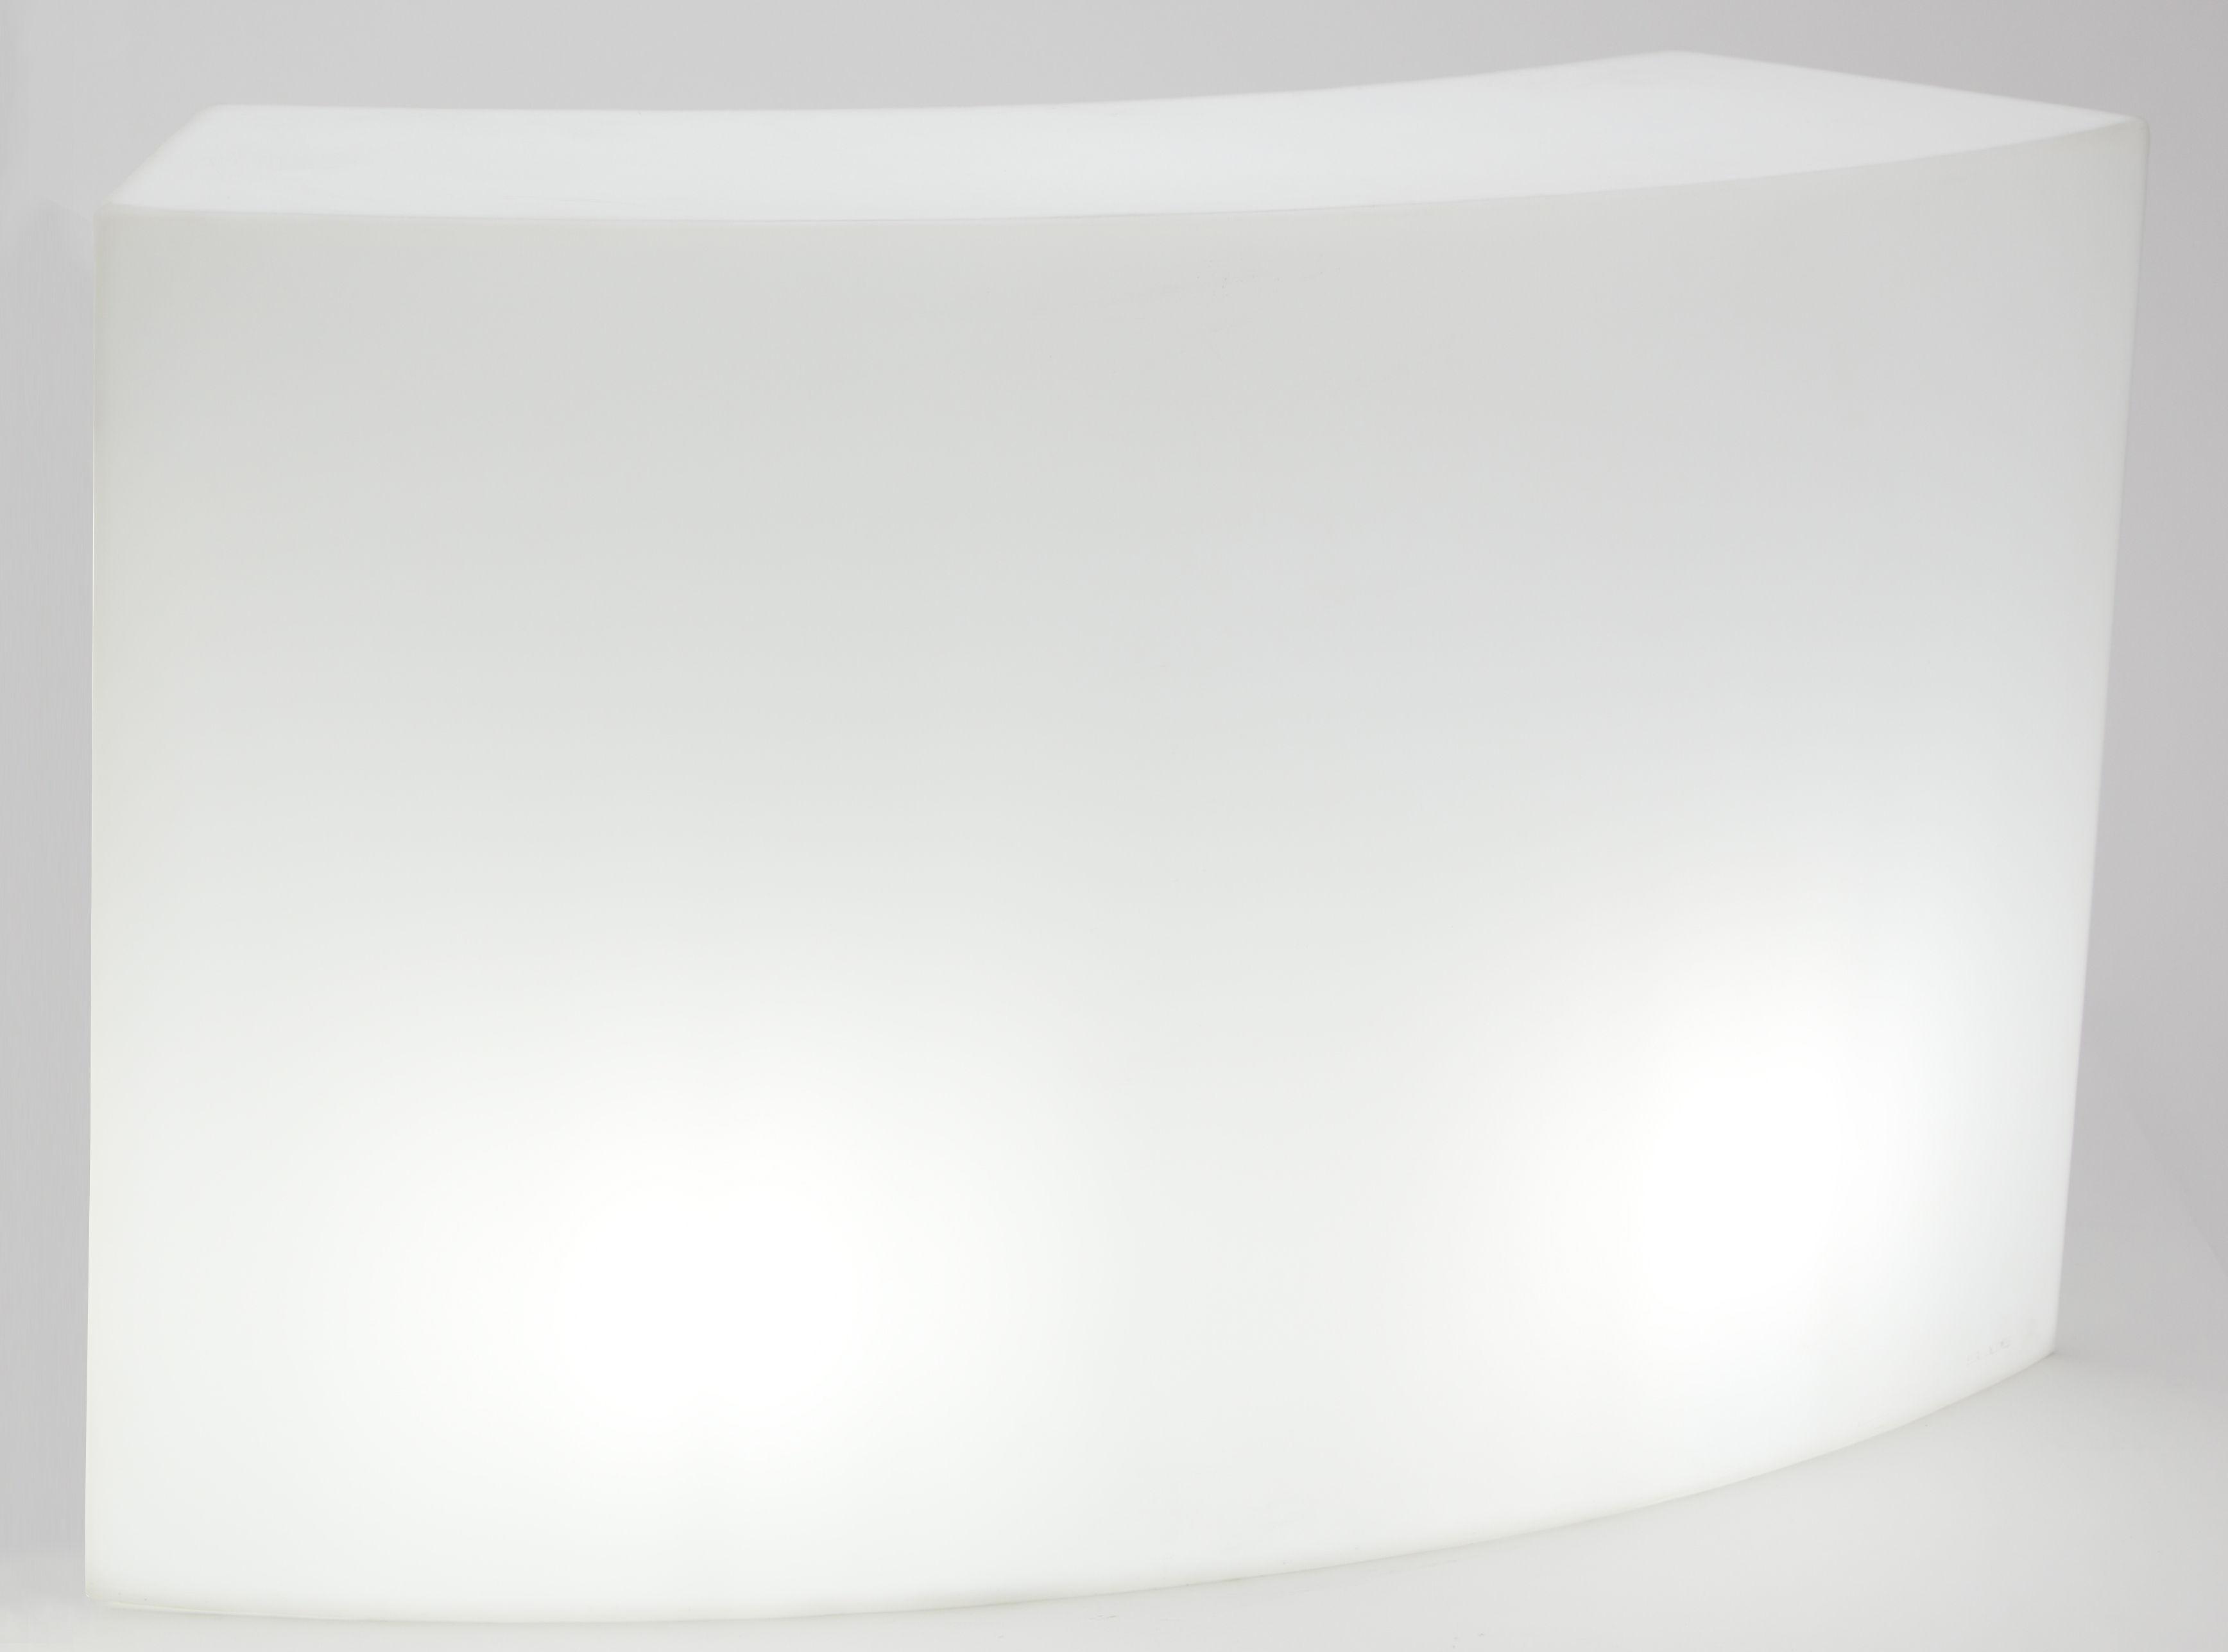 Arredamento - Tavoli alti - Bancone luminoso Snack LED RGB - / L 165 cm - Senza fili di Slide - Bianco - Polietilene